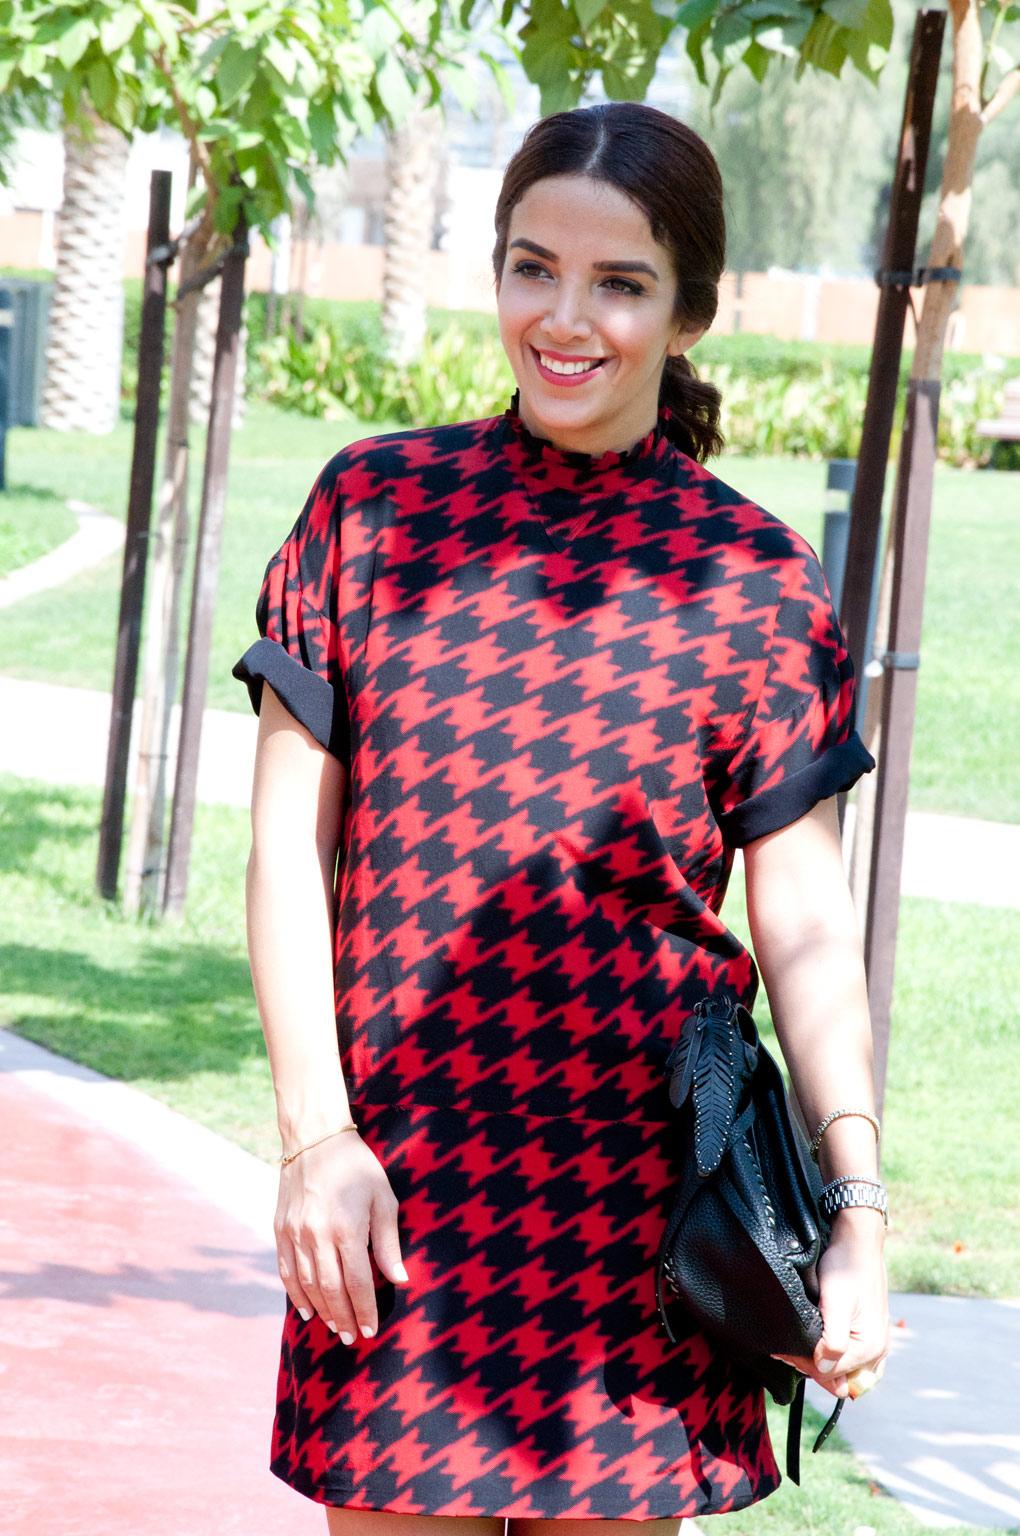 Lyla_Loves_Fashion_Coach_FW2014_houndstooth_dress_0929